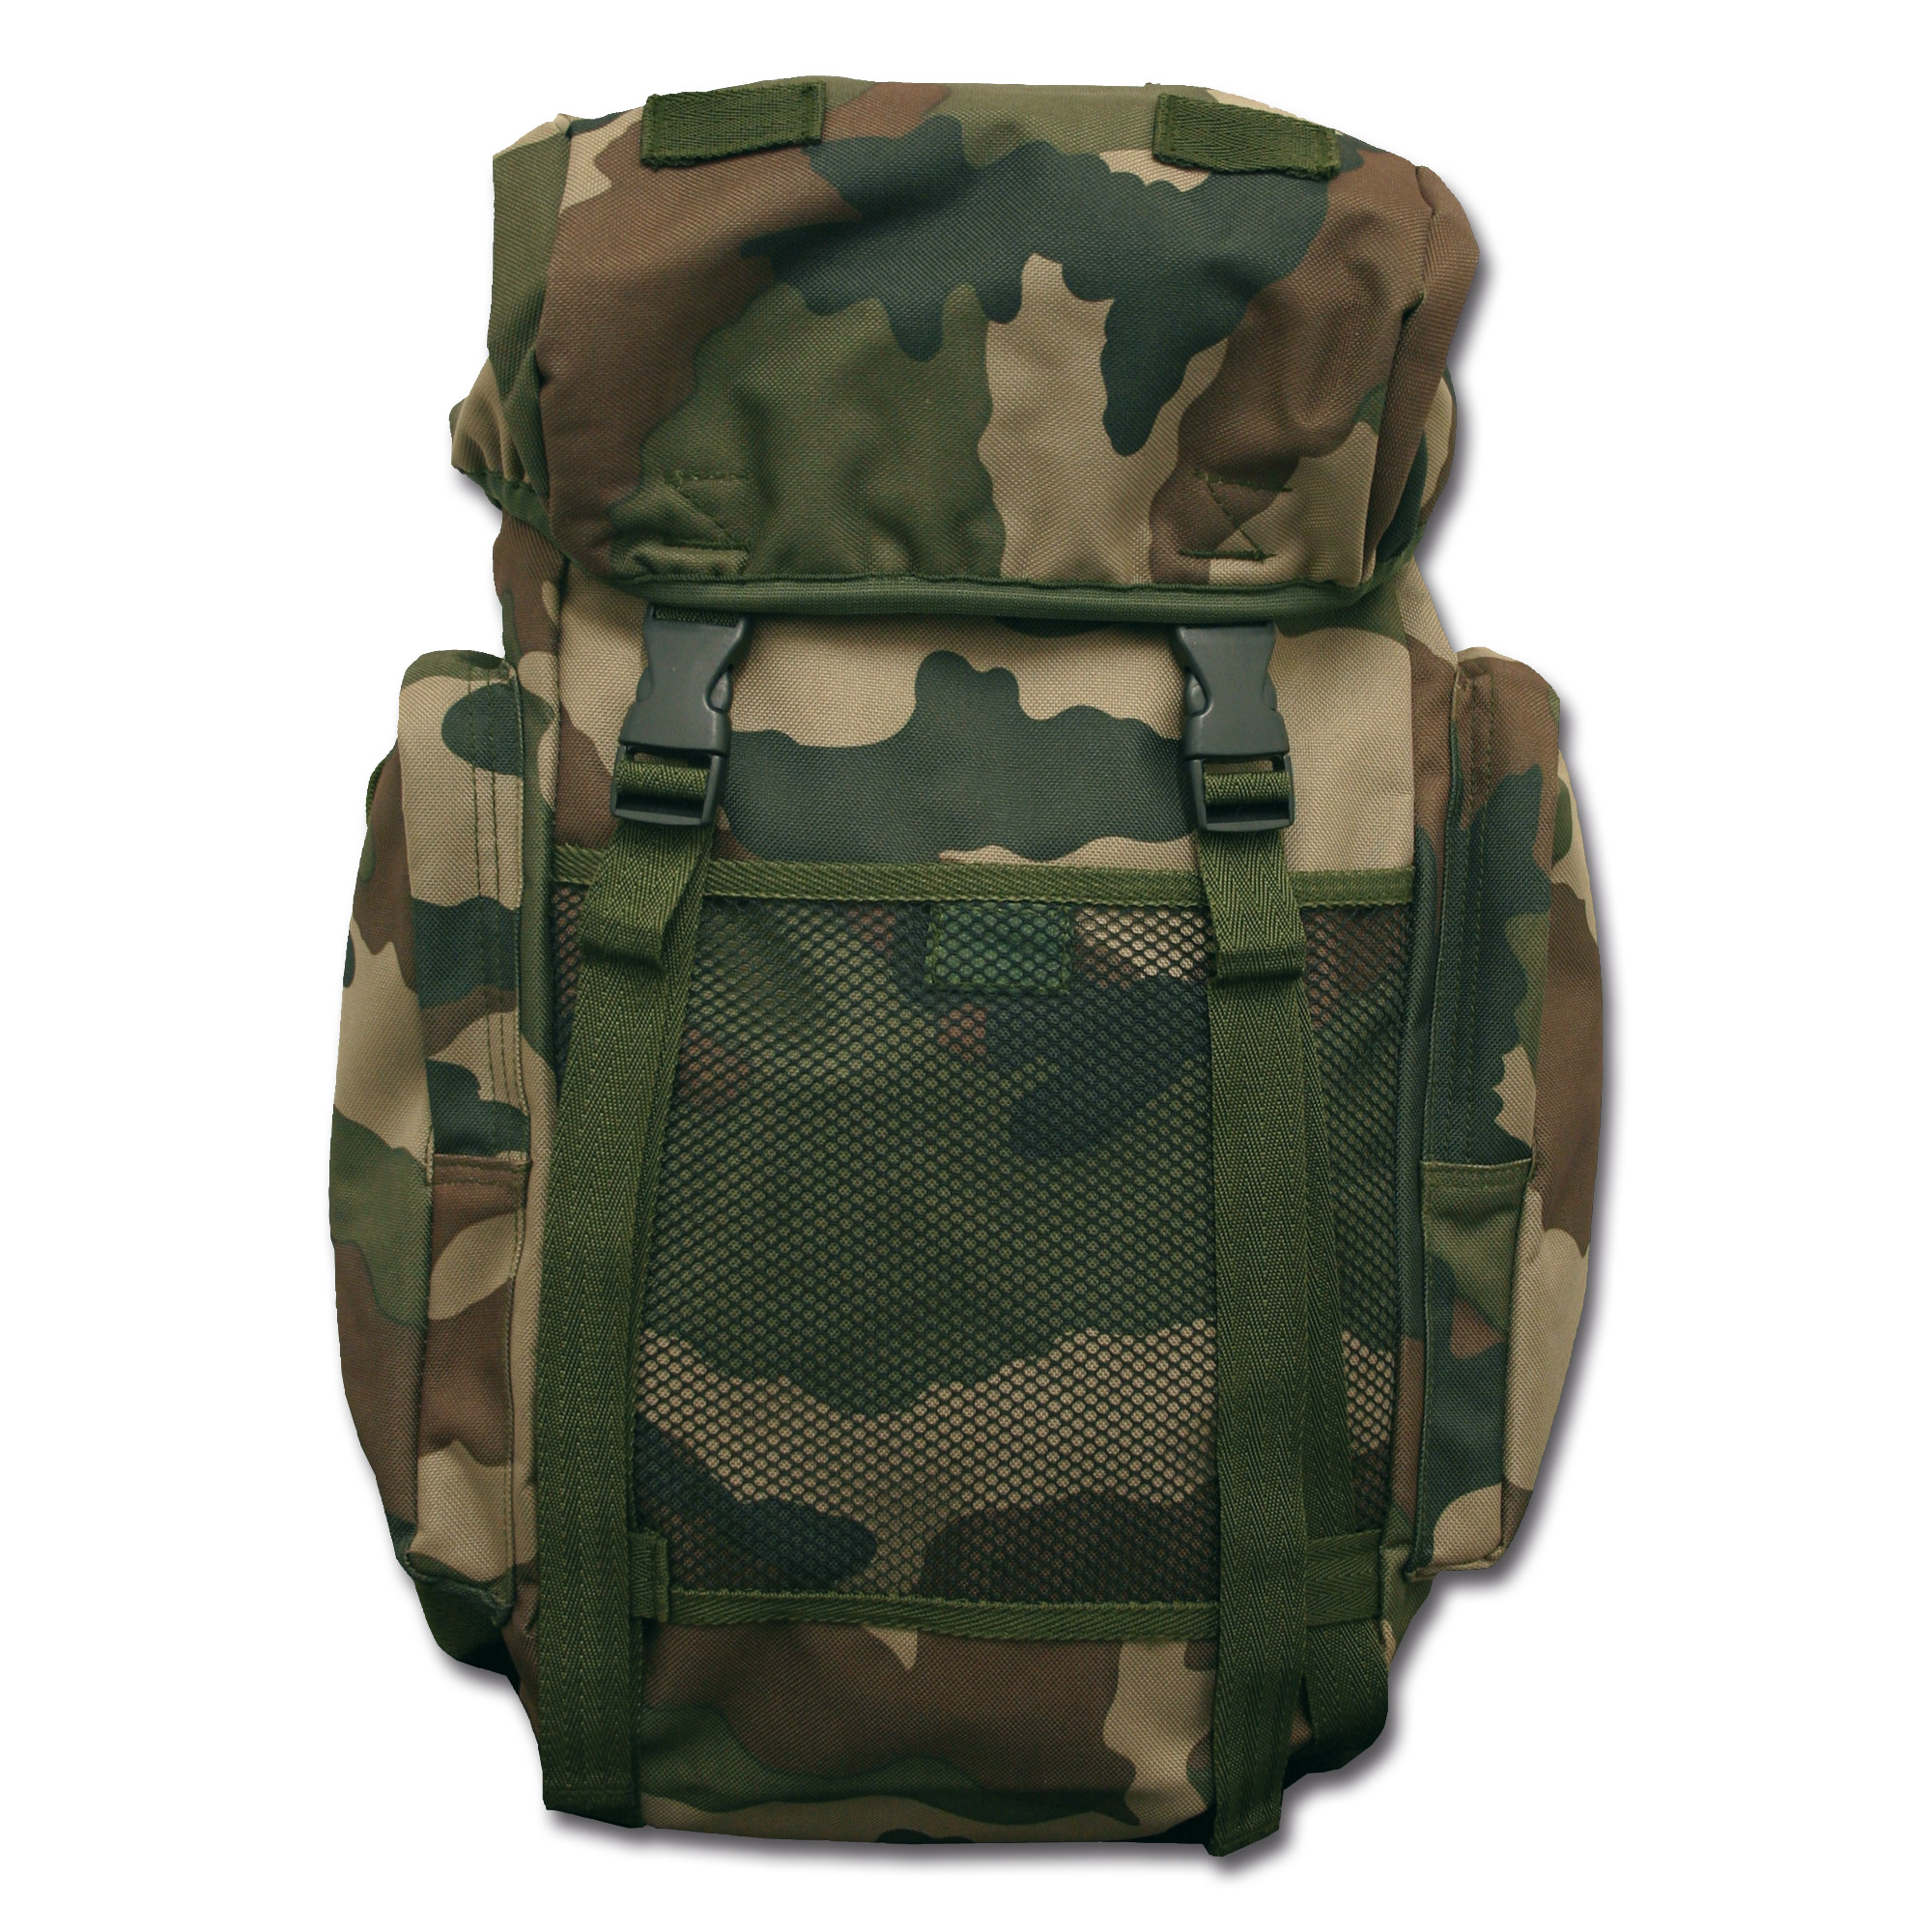 Rucksack DMB 35 CCE-tarn